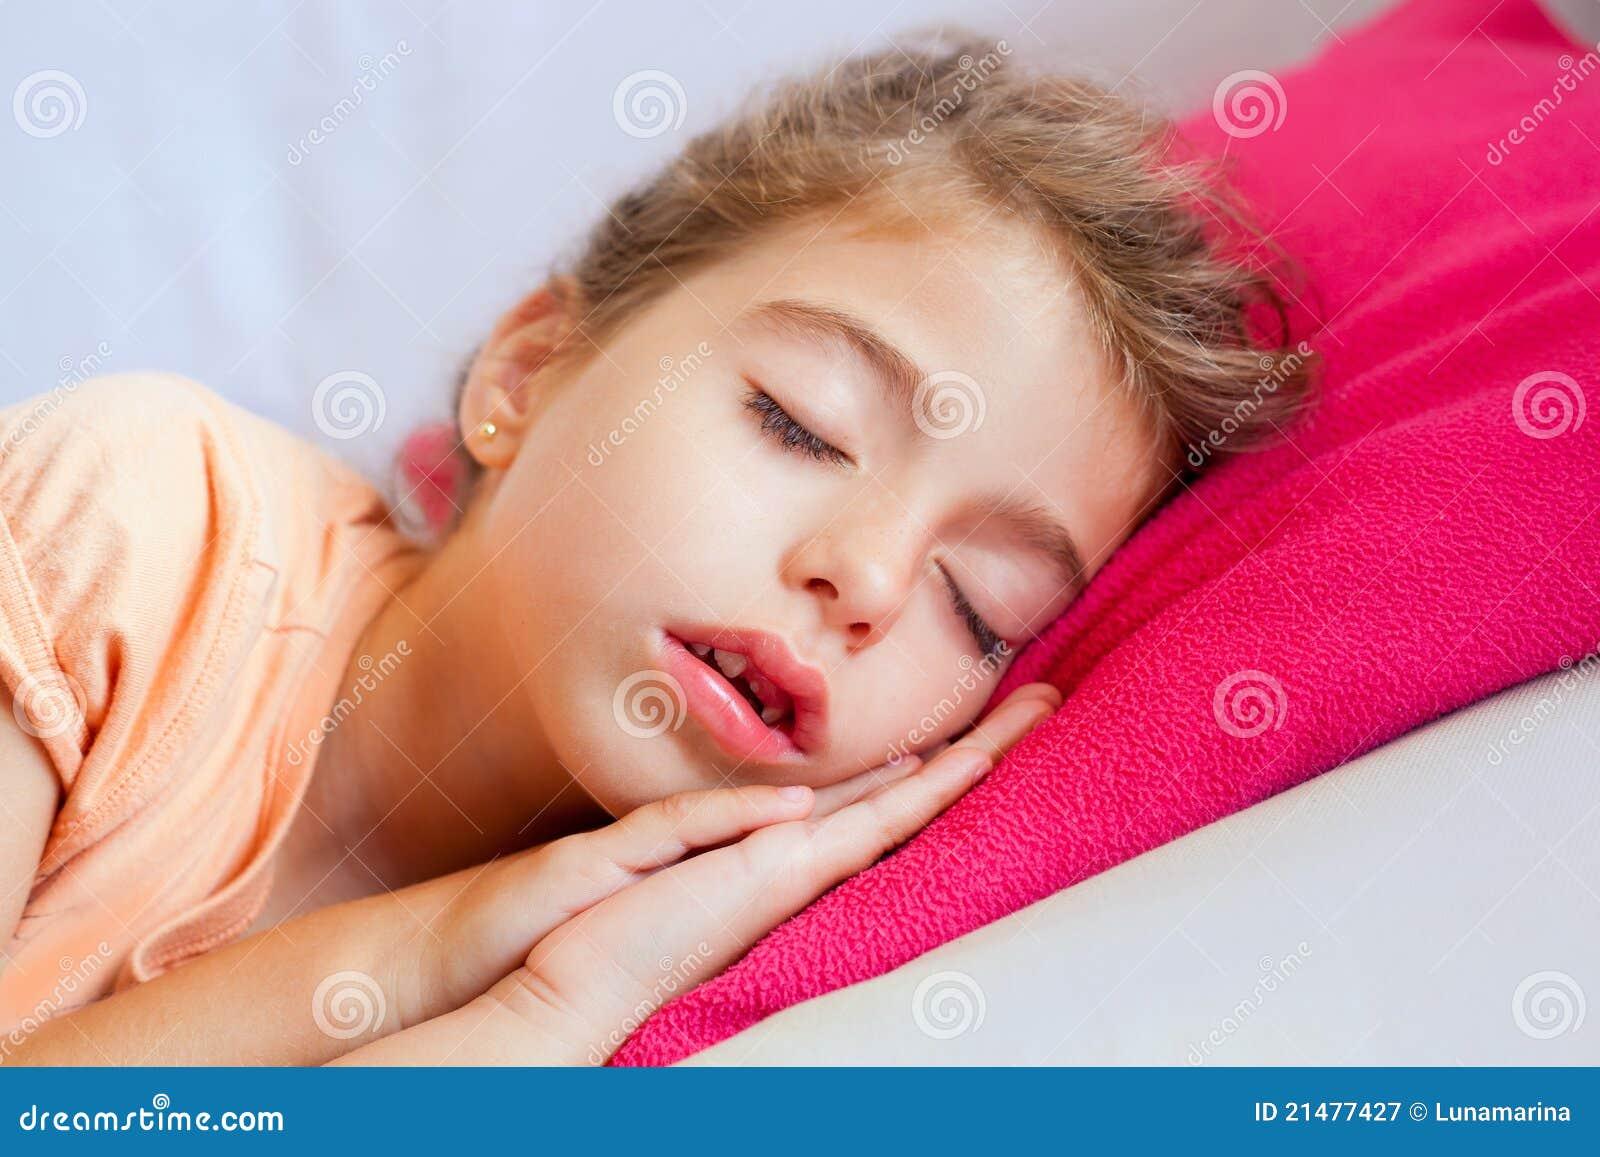 Deep Sleeping Children Girl Closeup Portrait Royalty Free